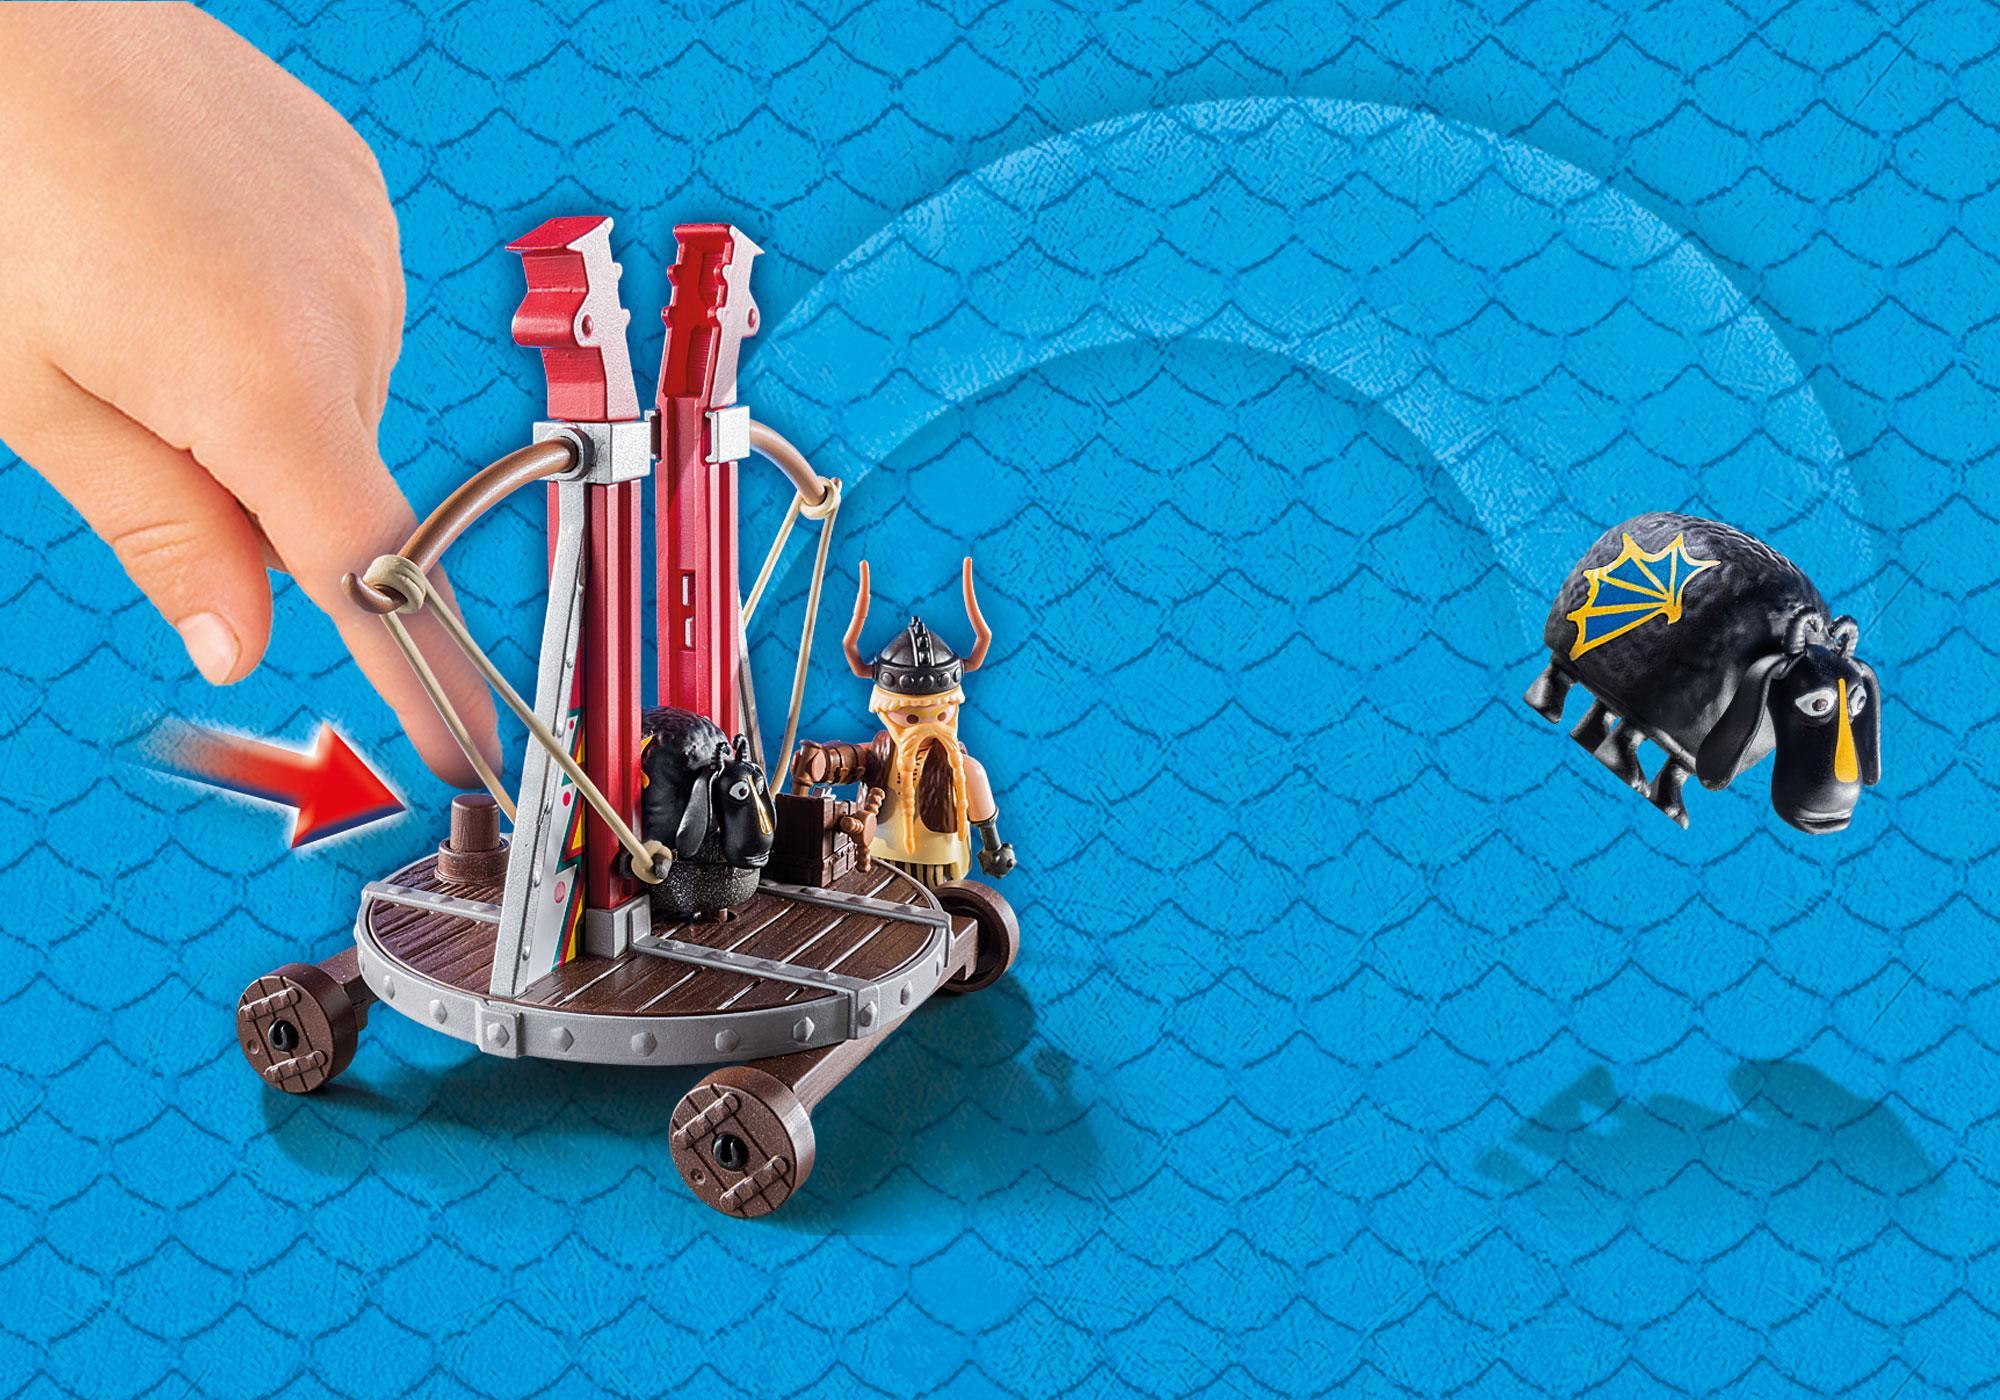 http://media.playmobil.com/i/playmobil/9461_product_extra1/Grobian mit Schafschleuder